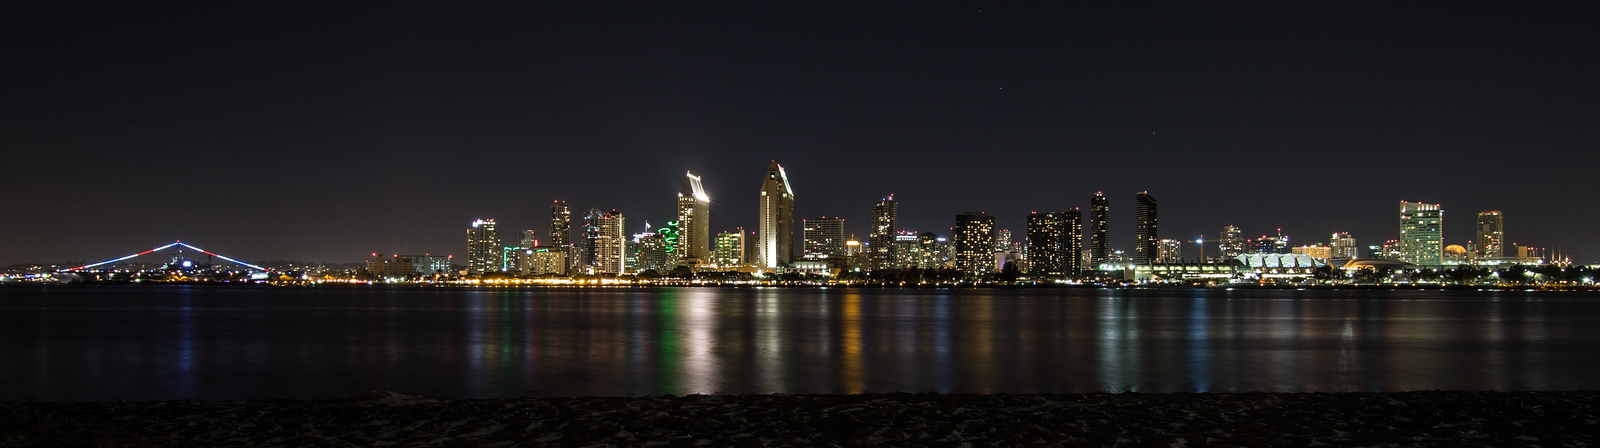 San Diego City Skyline at Nighttime